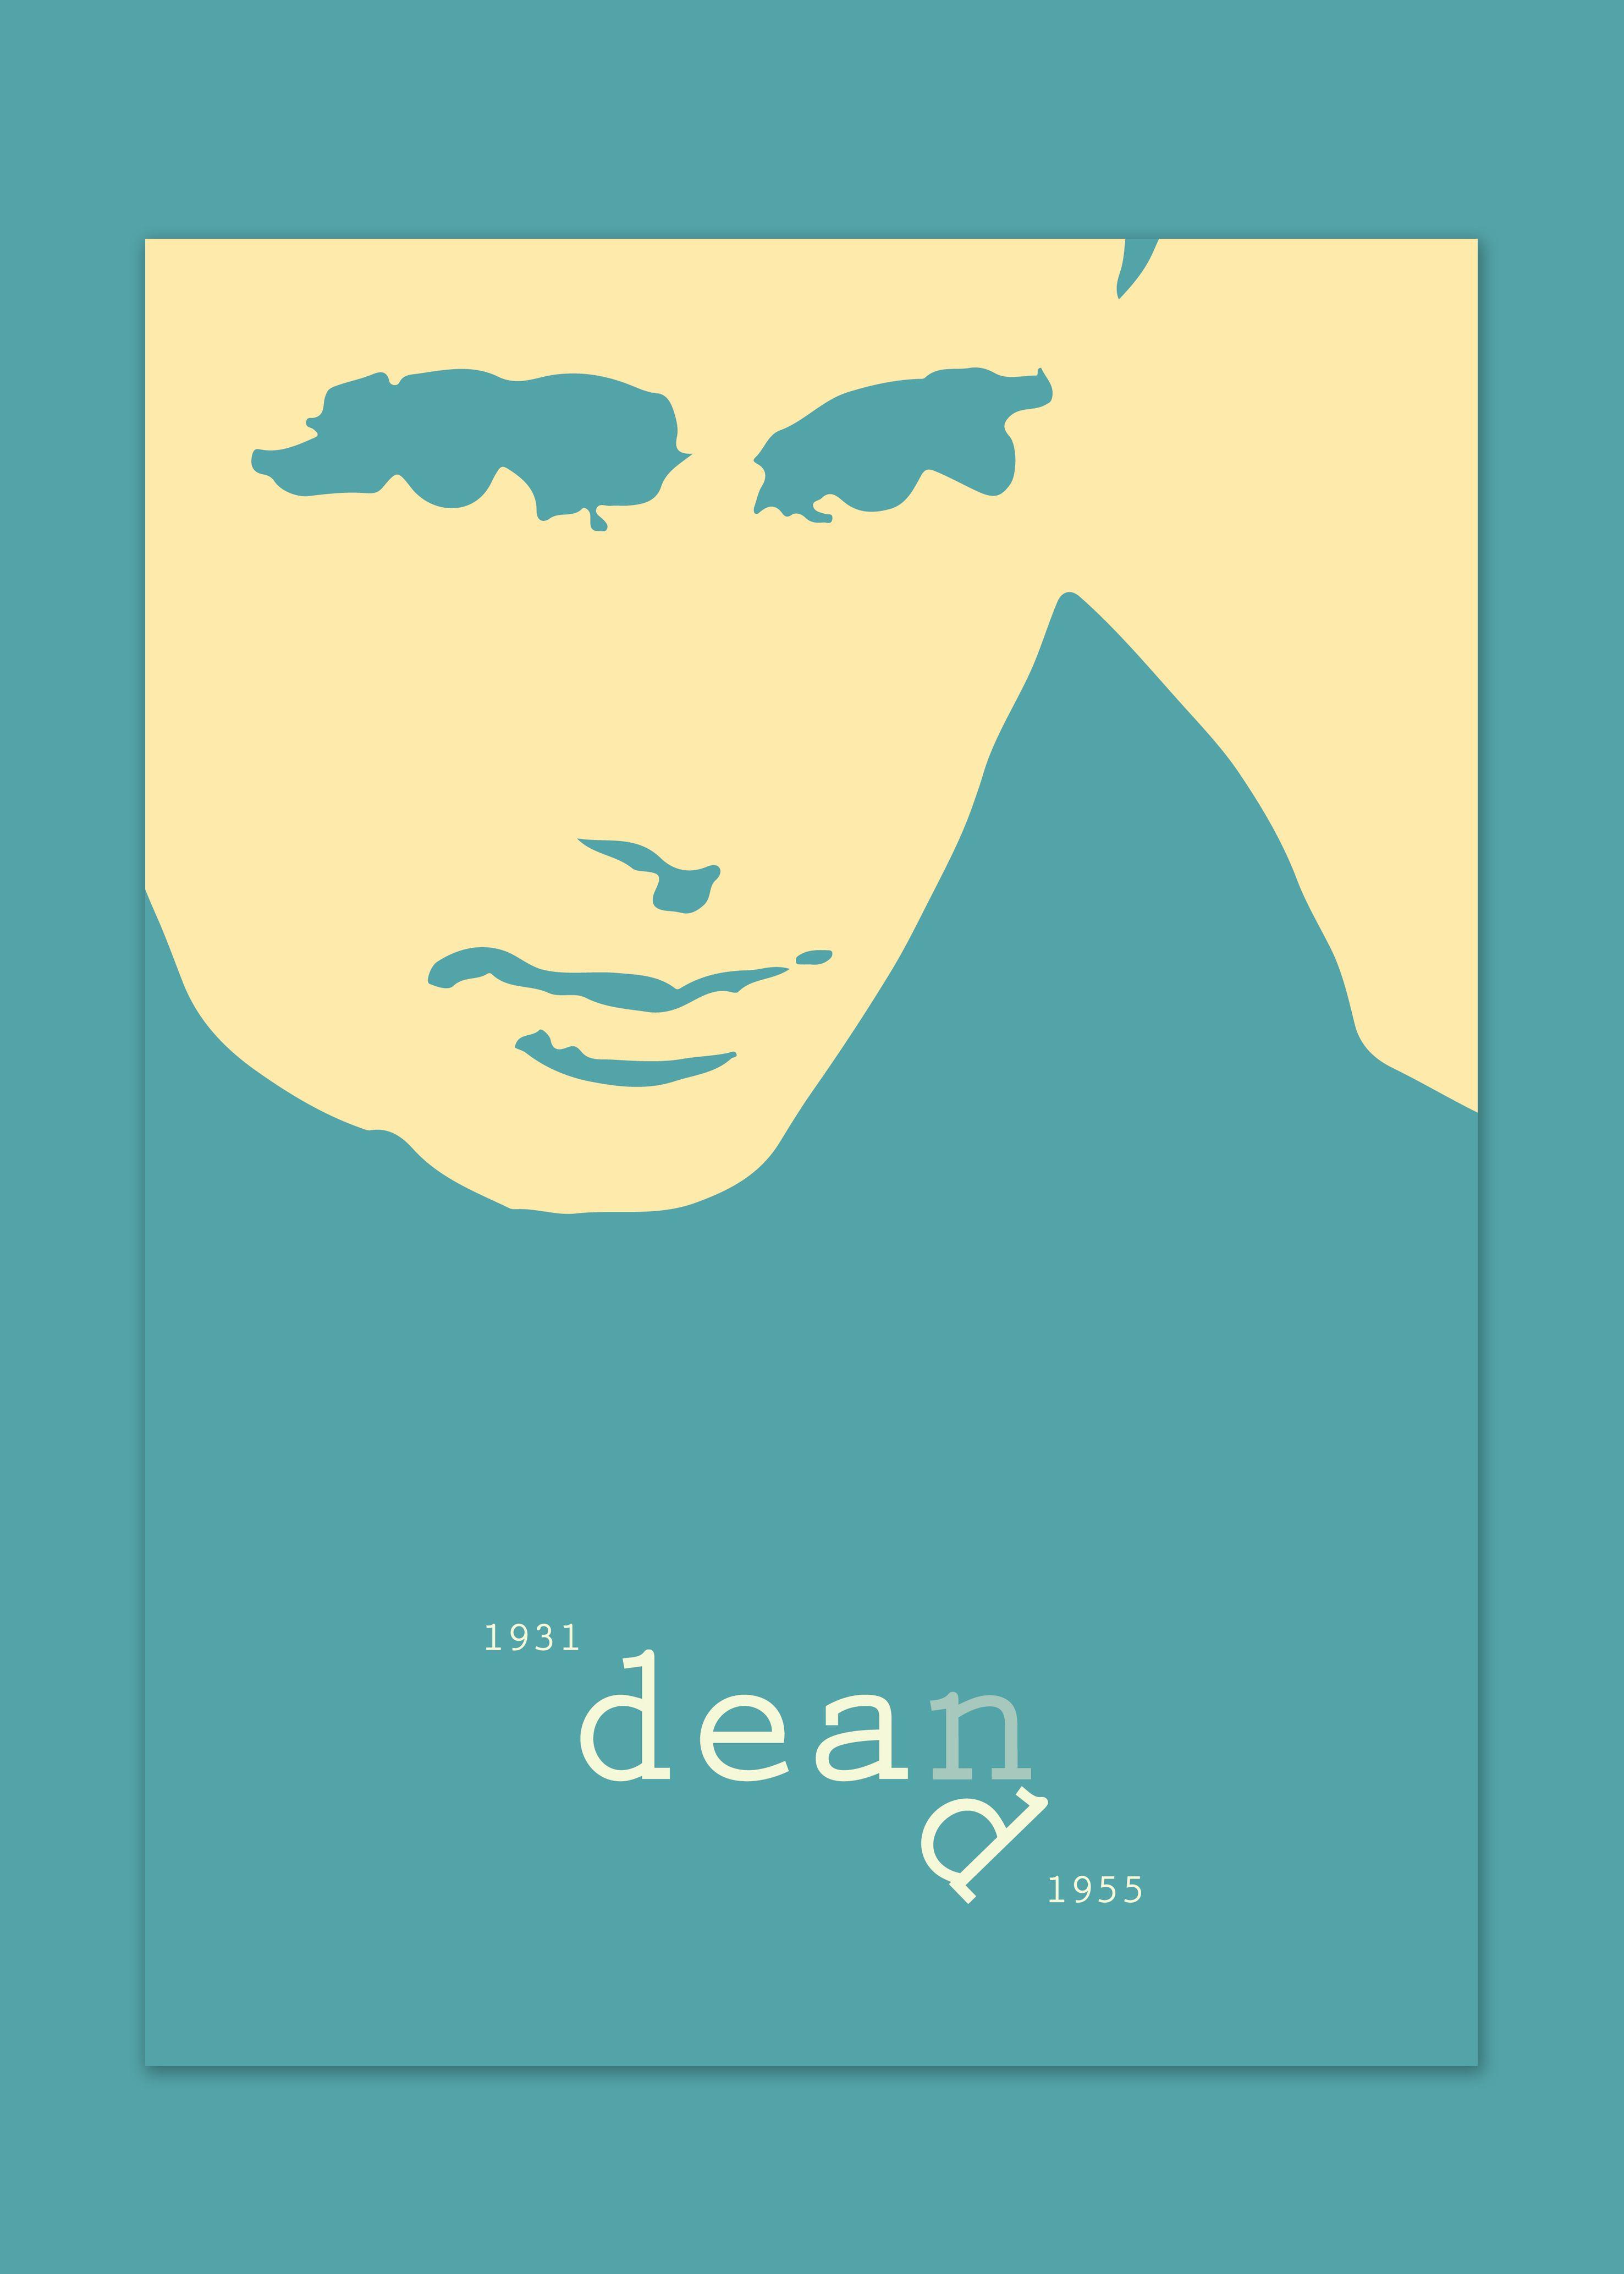 Dean Dead poster, por Sr Fuego Micky Malacostra.